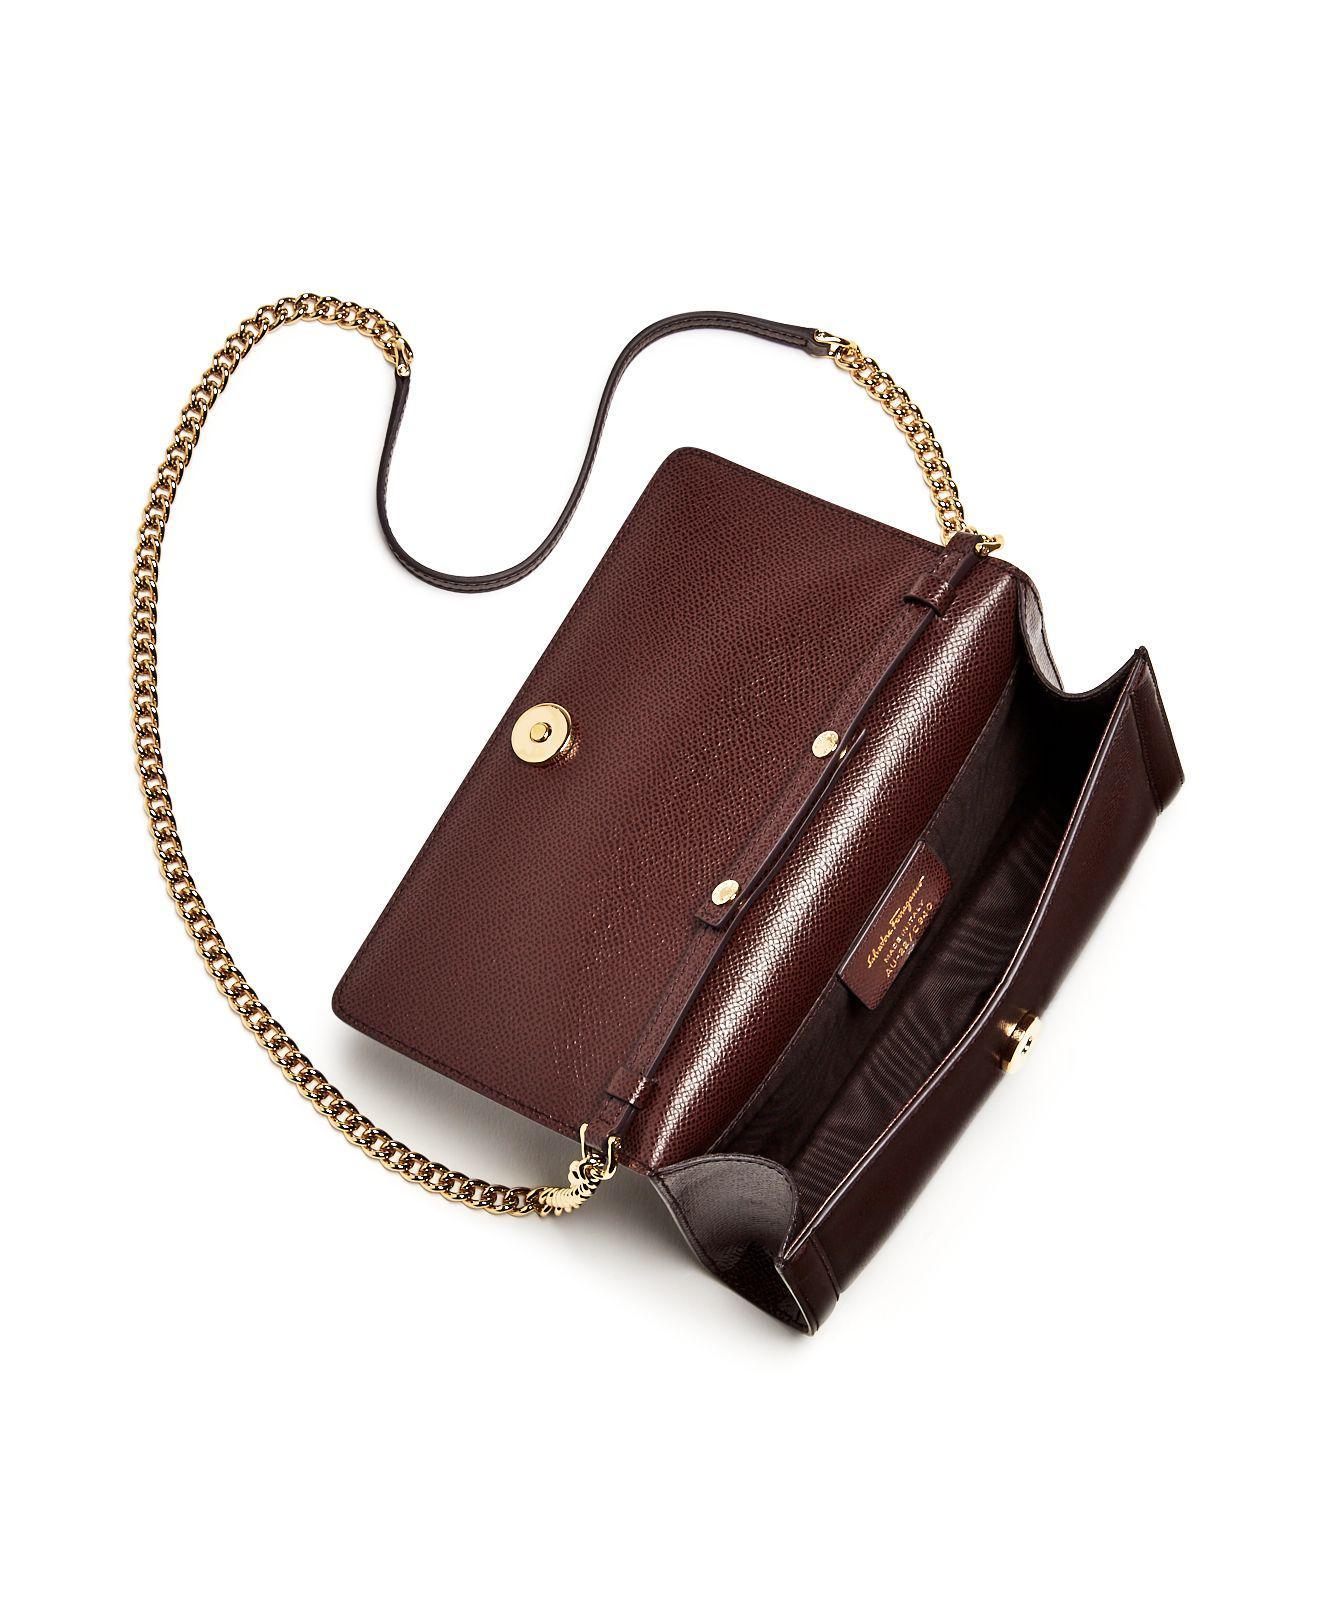 Lyst - Ferragamo Miss Vara Bow Leather Mini Bag 176d68c3a0180